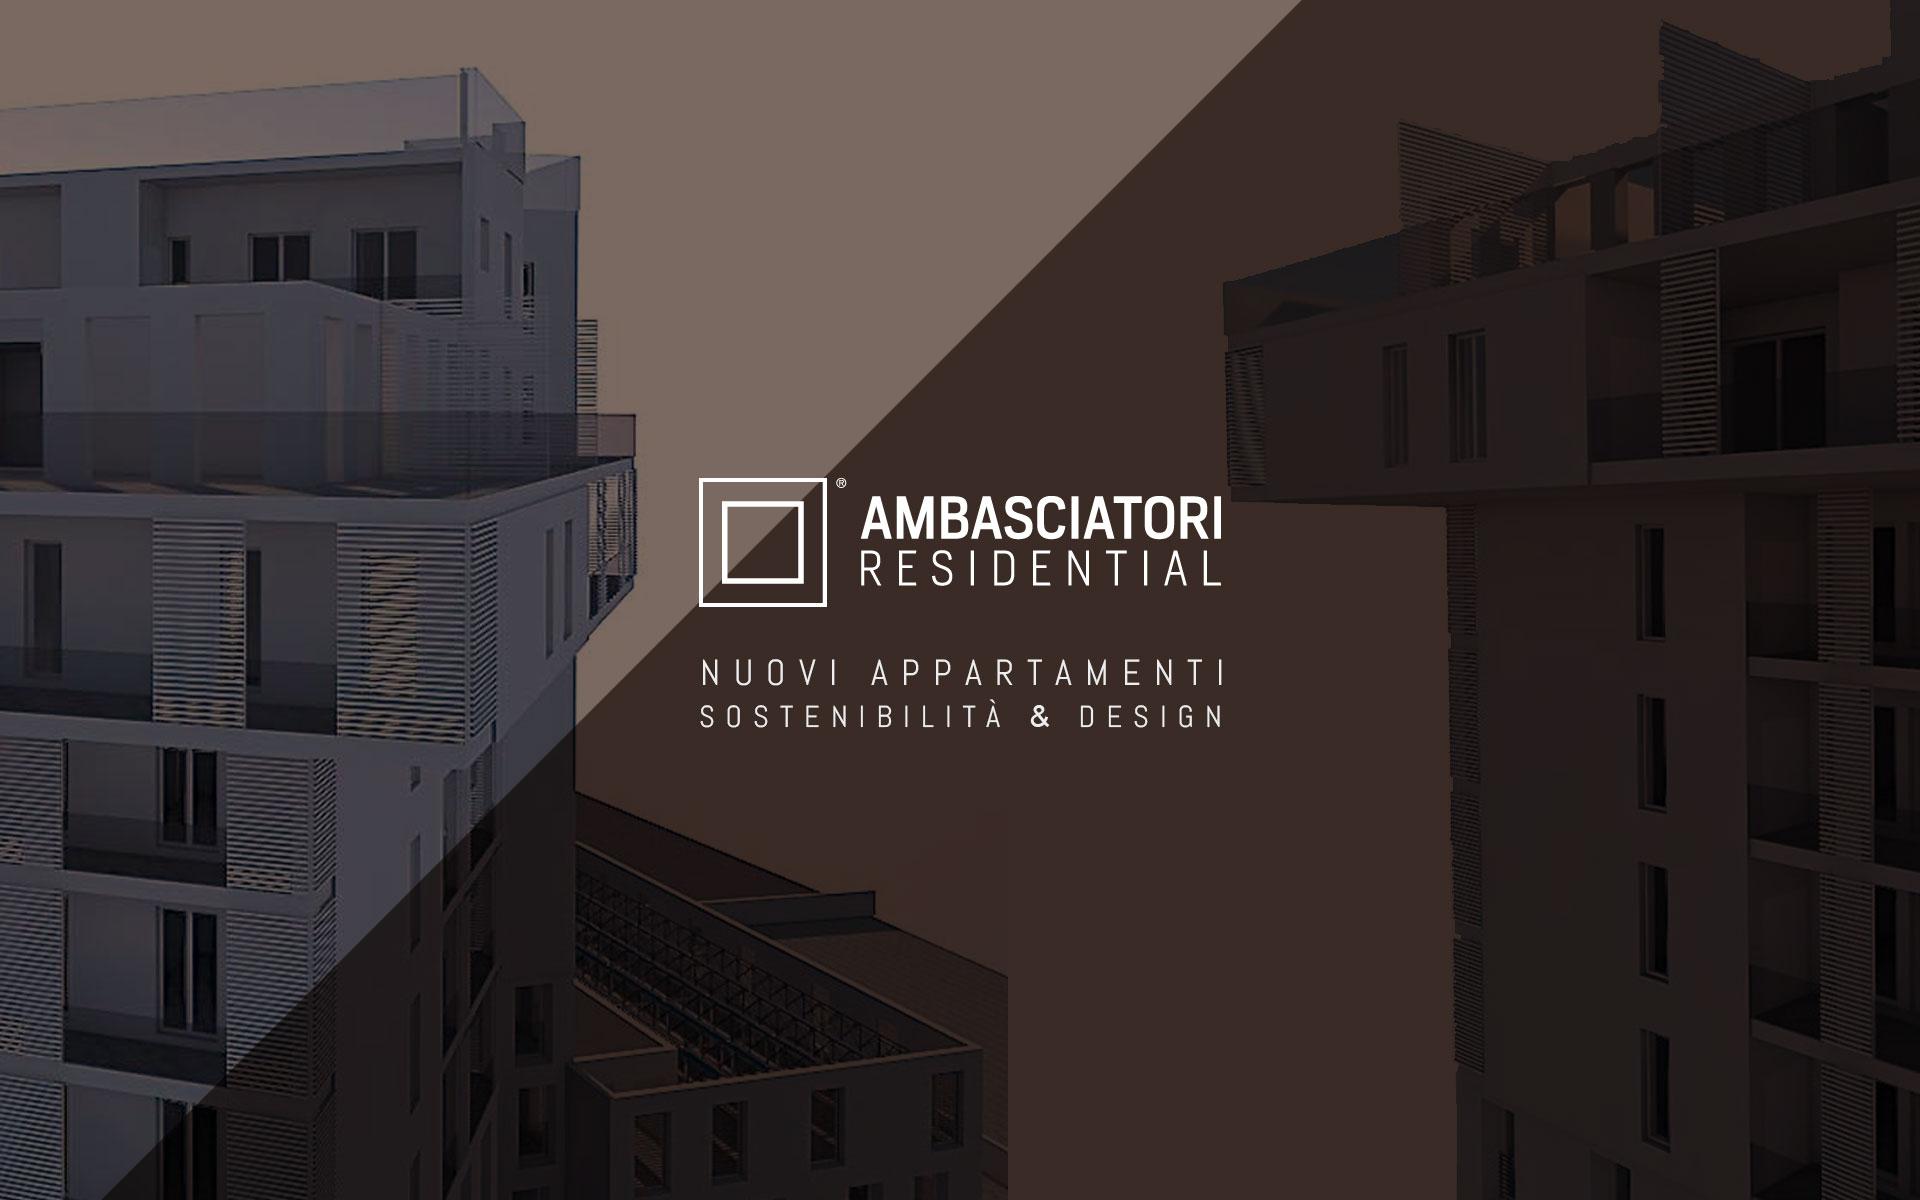 ambasciatori residential pm advisors bari